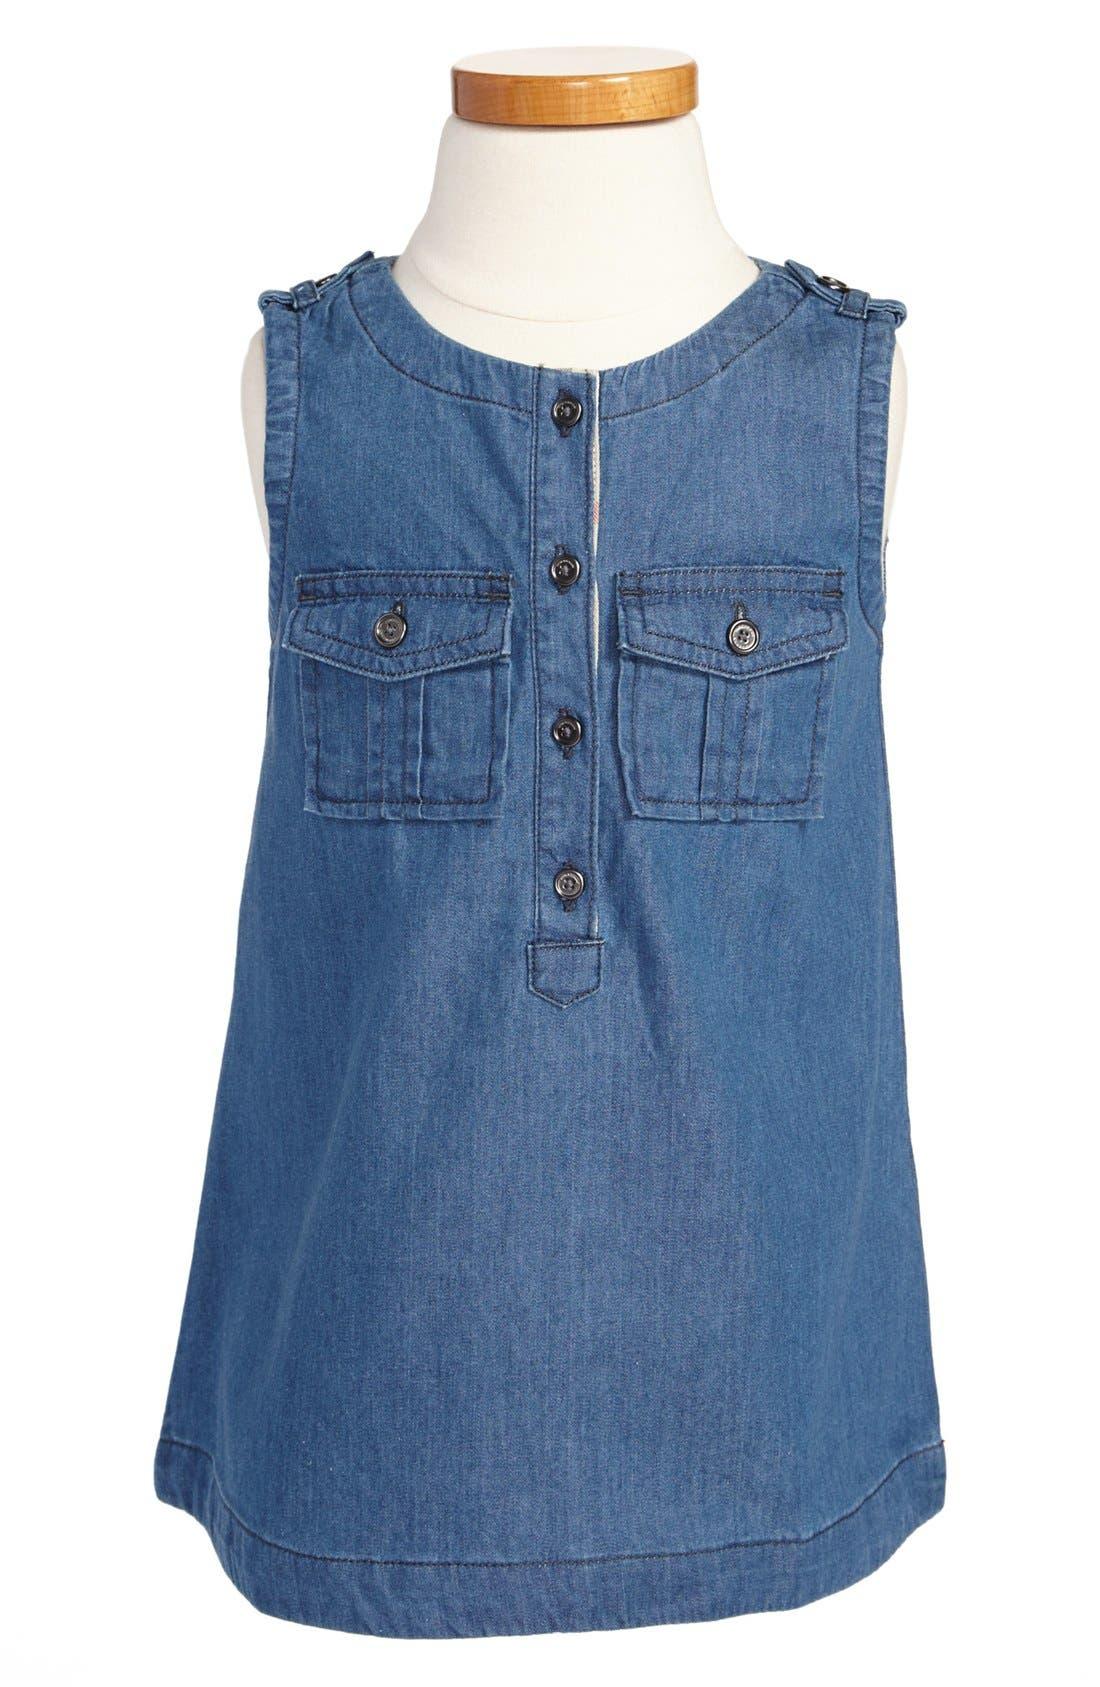 Alternate Image 1 Selected - Burberry 'Josephine' Dress (Toddler Girls)